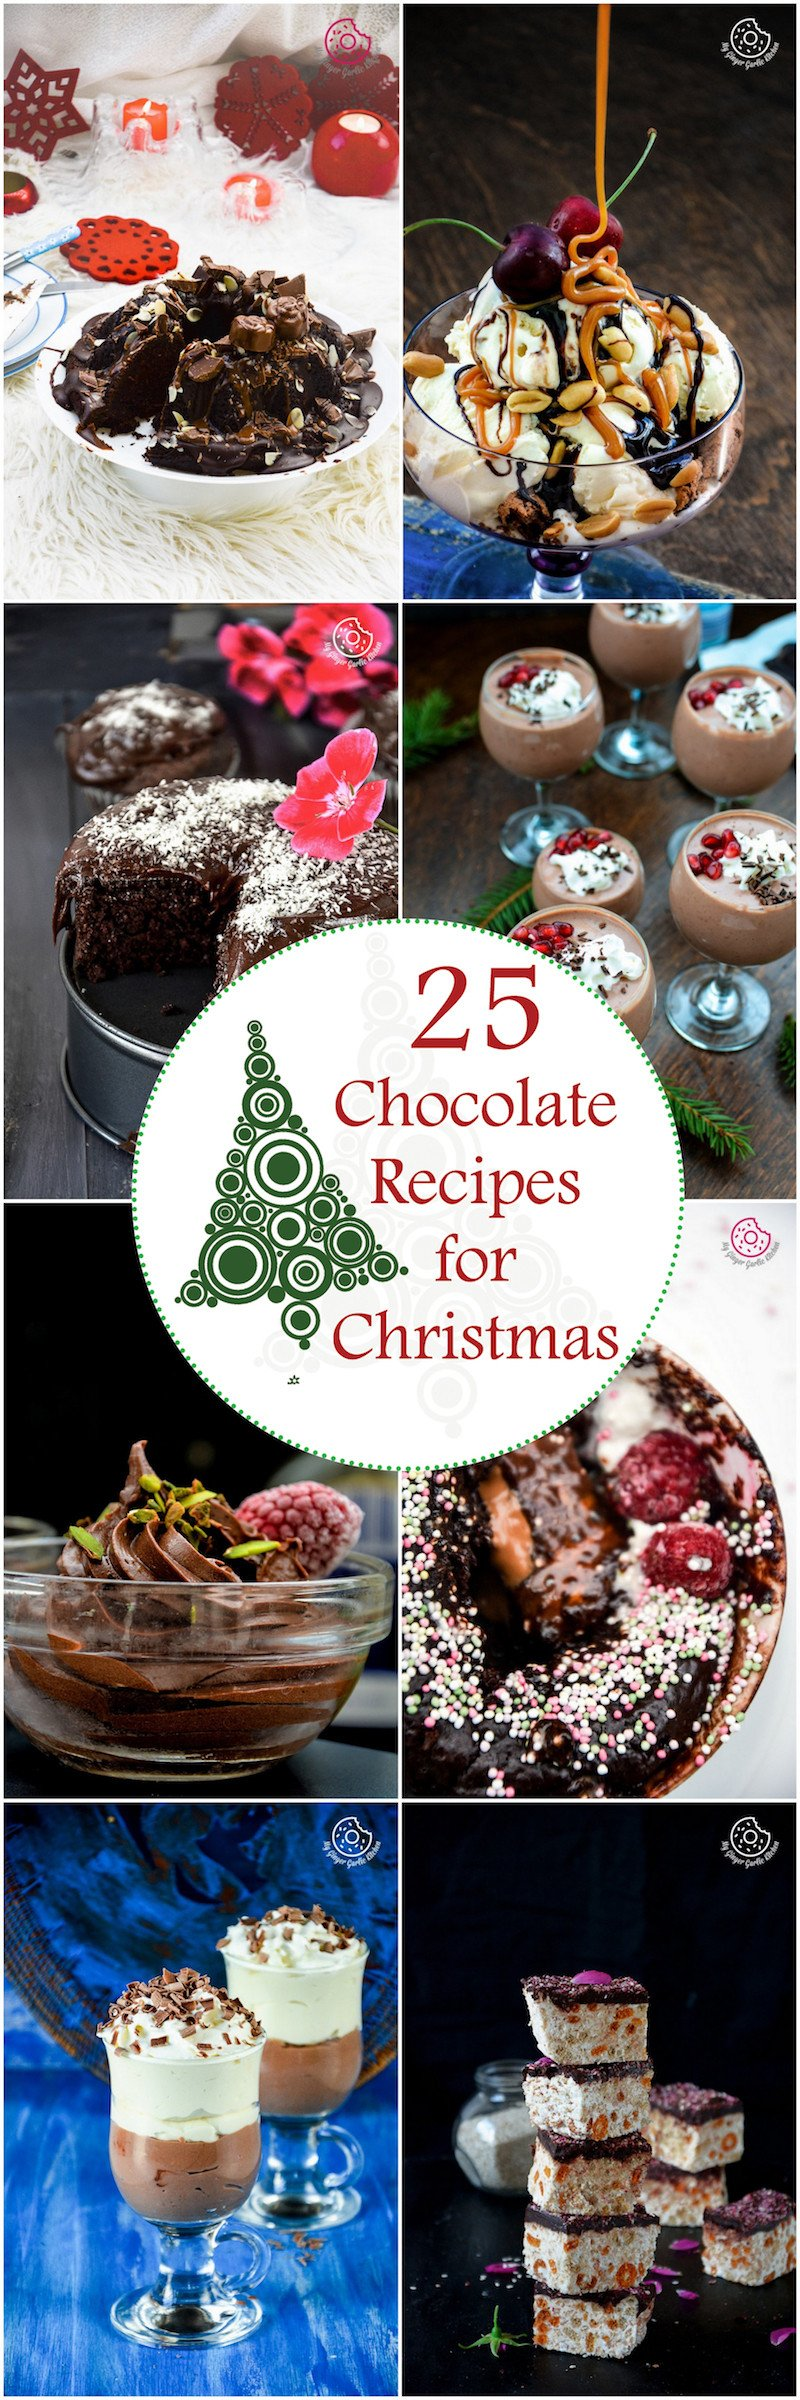 25-chocolate-recipes-for-christmas|mygingergarlickitchen.com/ @anupama_dreams